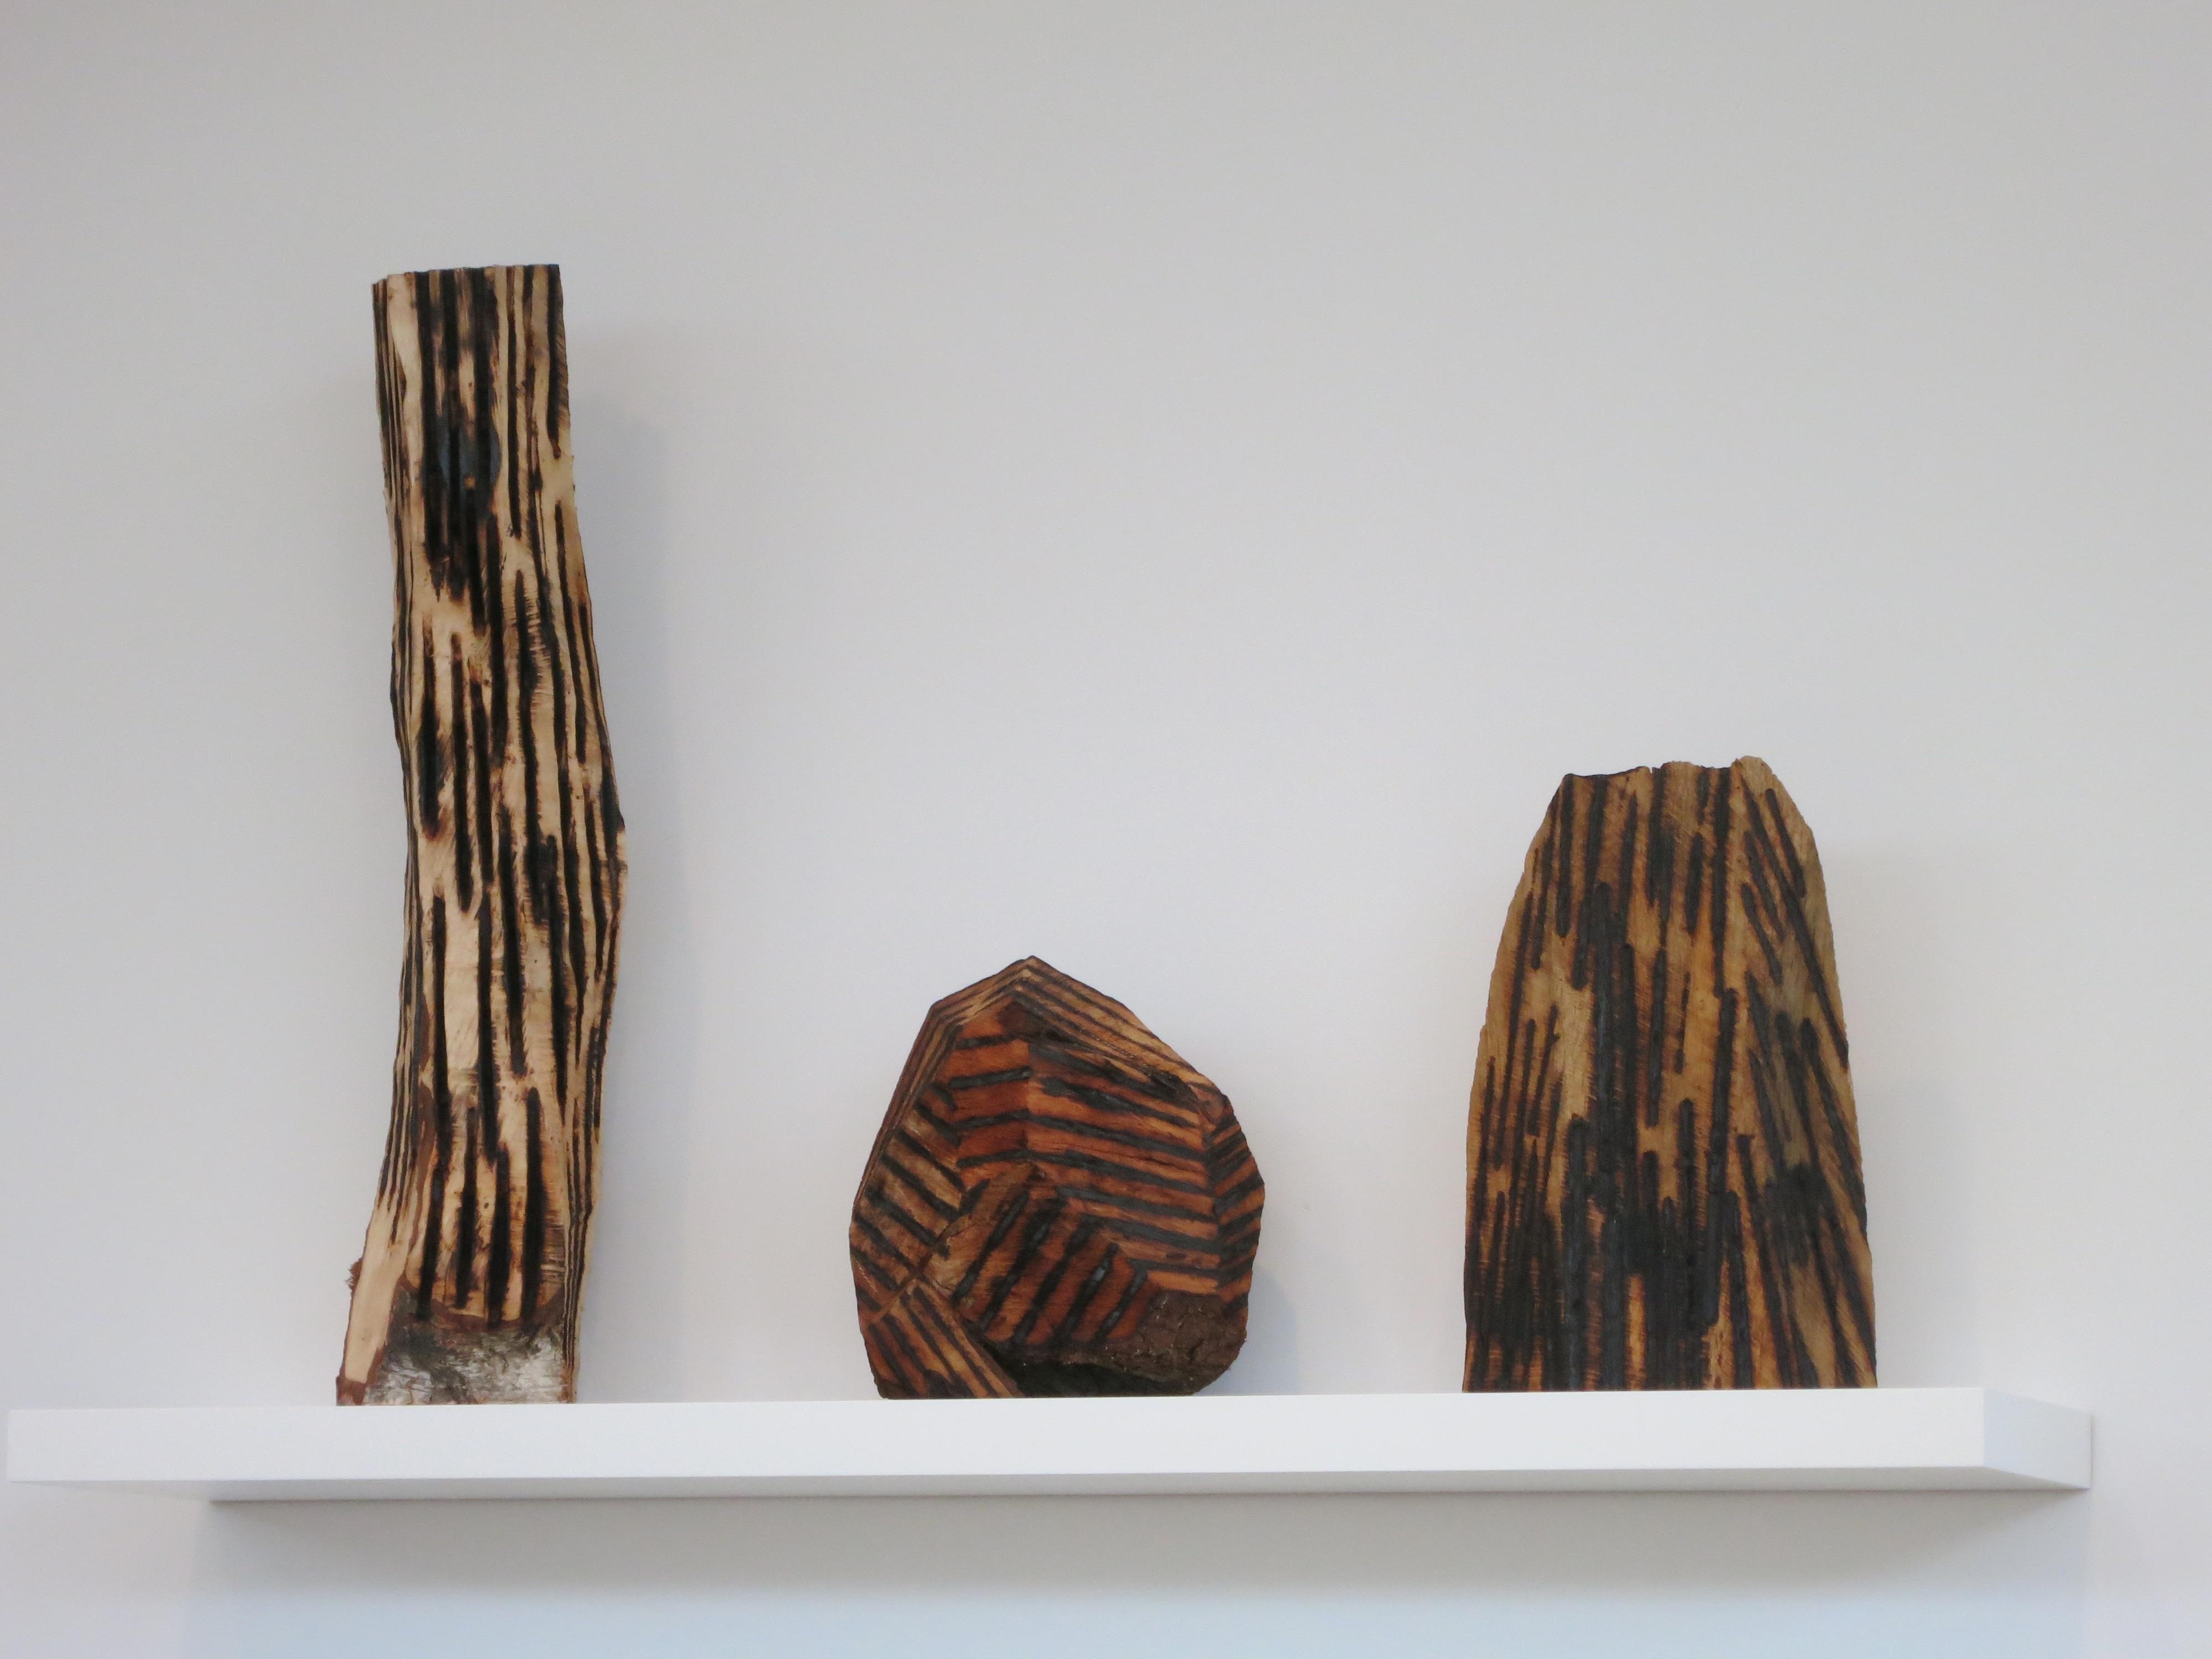 Free Images Driftwood Wood Statue Vase Pattern Ceramic Brown